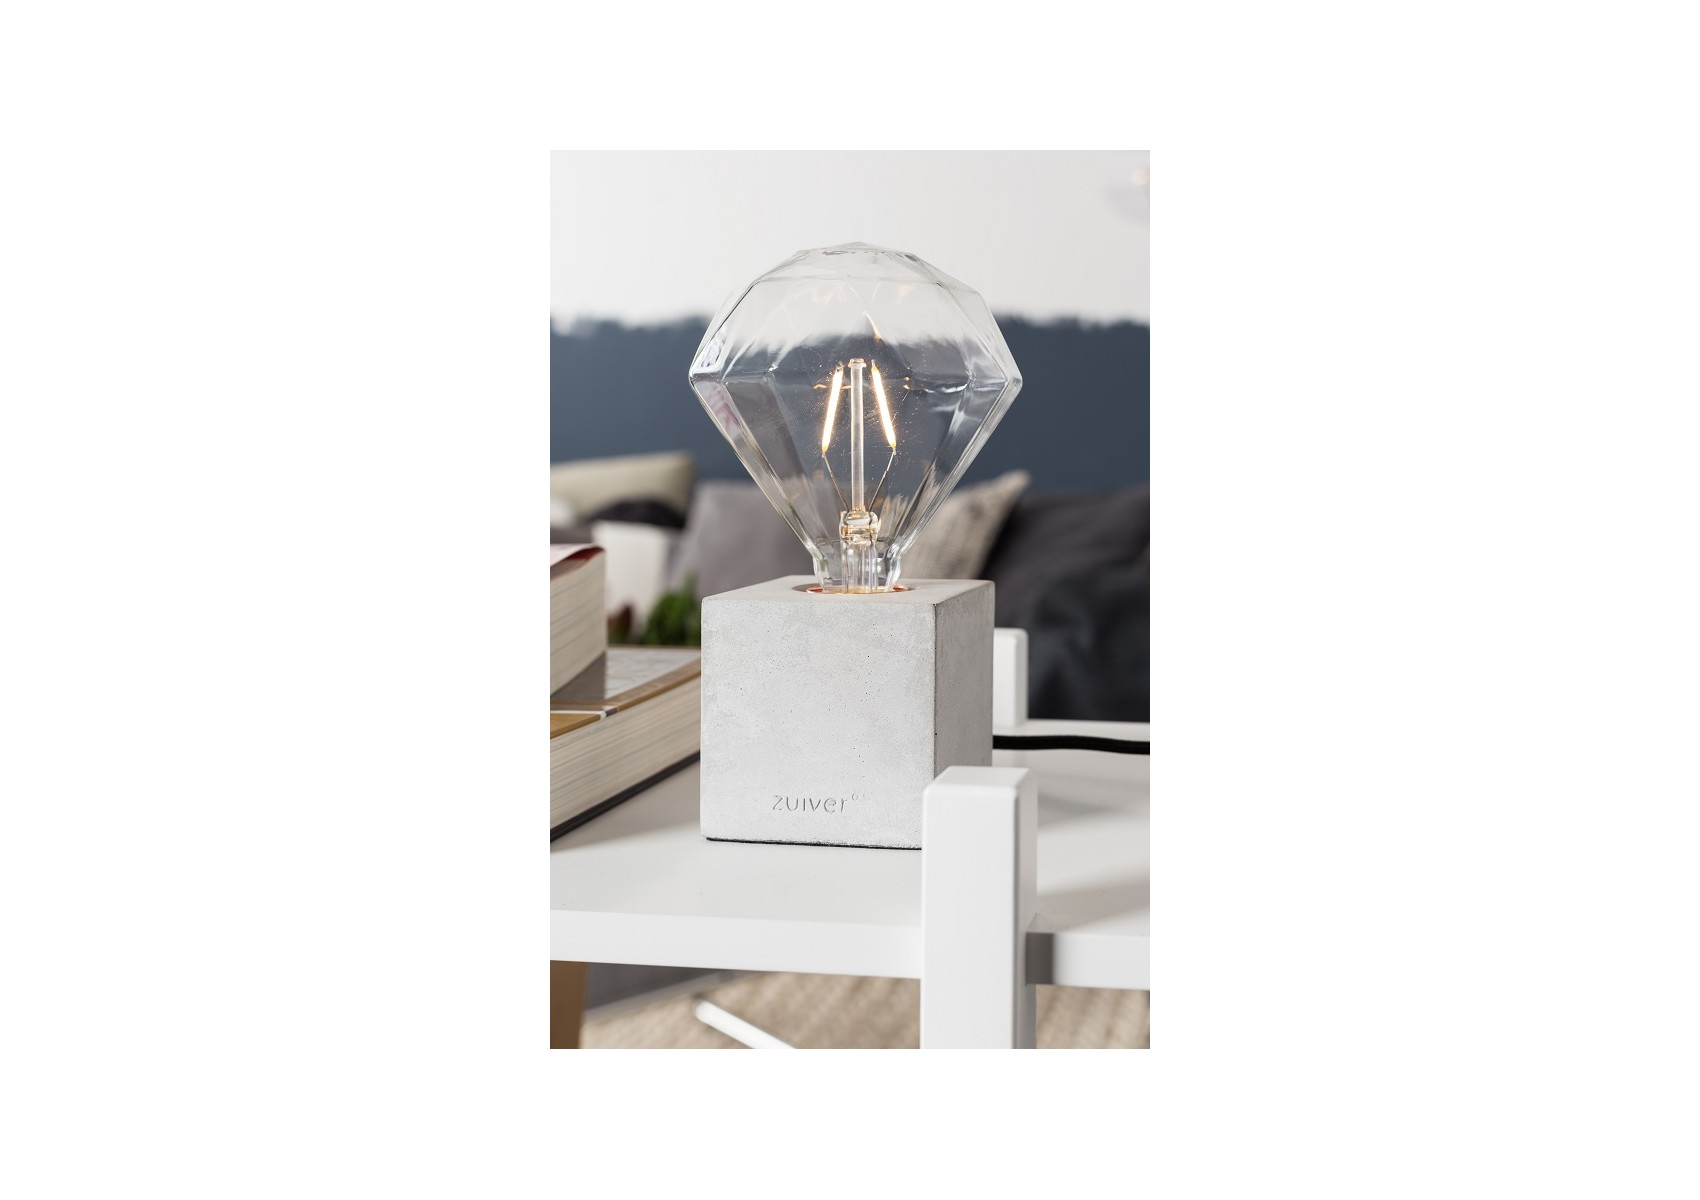 lampe poser design cube de la collection bolch de chez zuiver. Black Bedroom Furniture Sets. Home Design Ideas